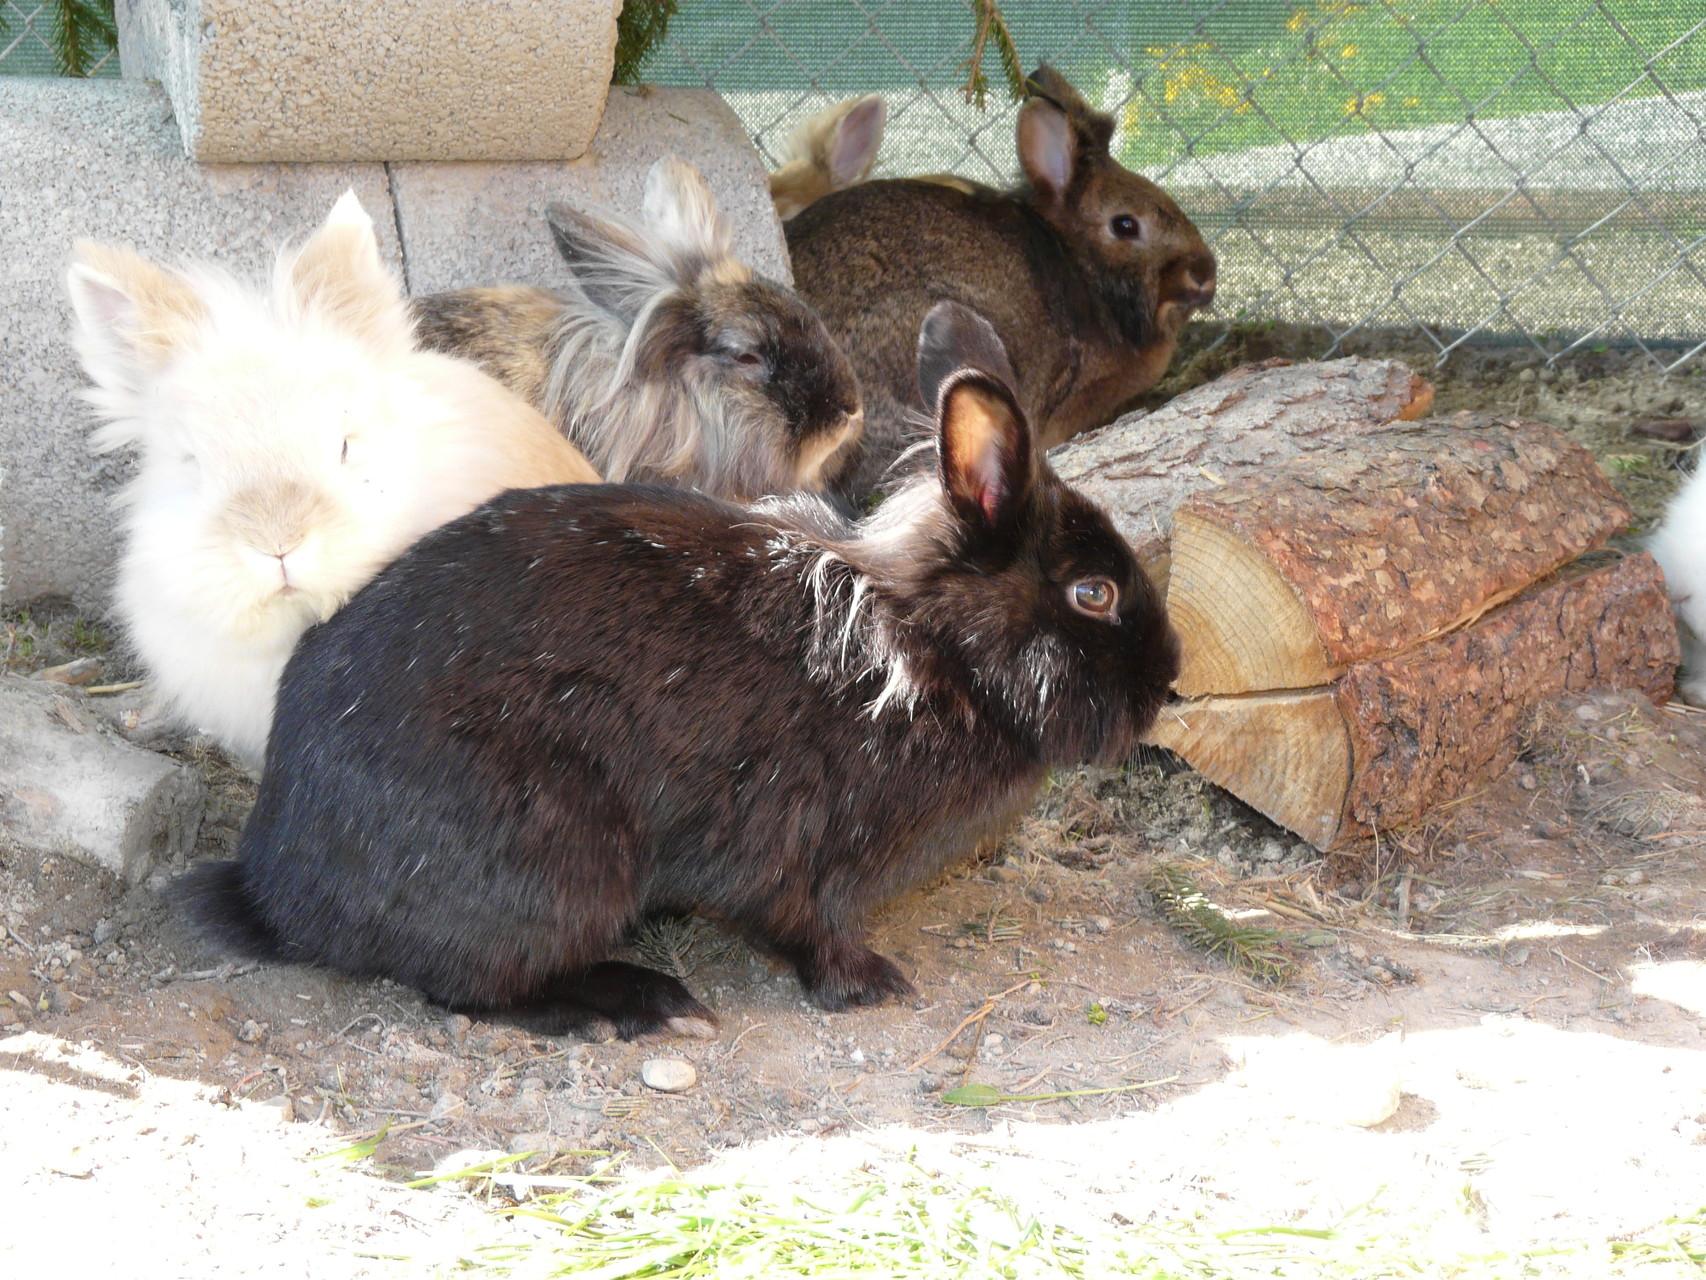 Our bunnies in the garden